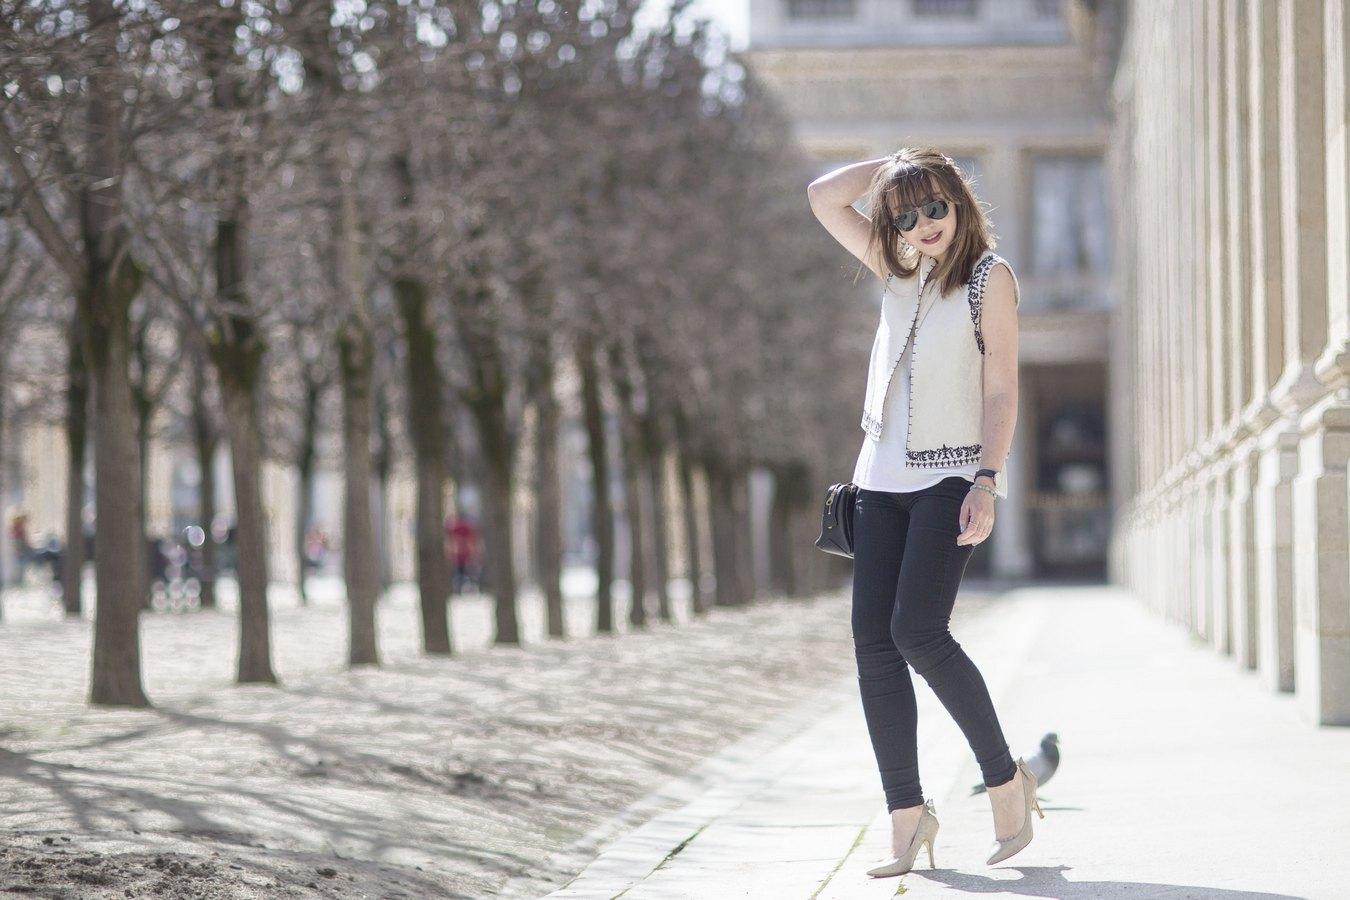 du style madame - streetstyle - mode femme - look femme - paris - boho - gypsy